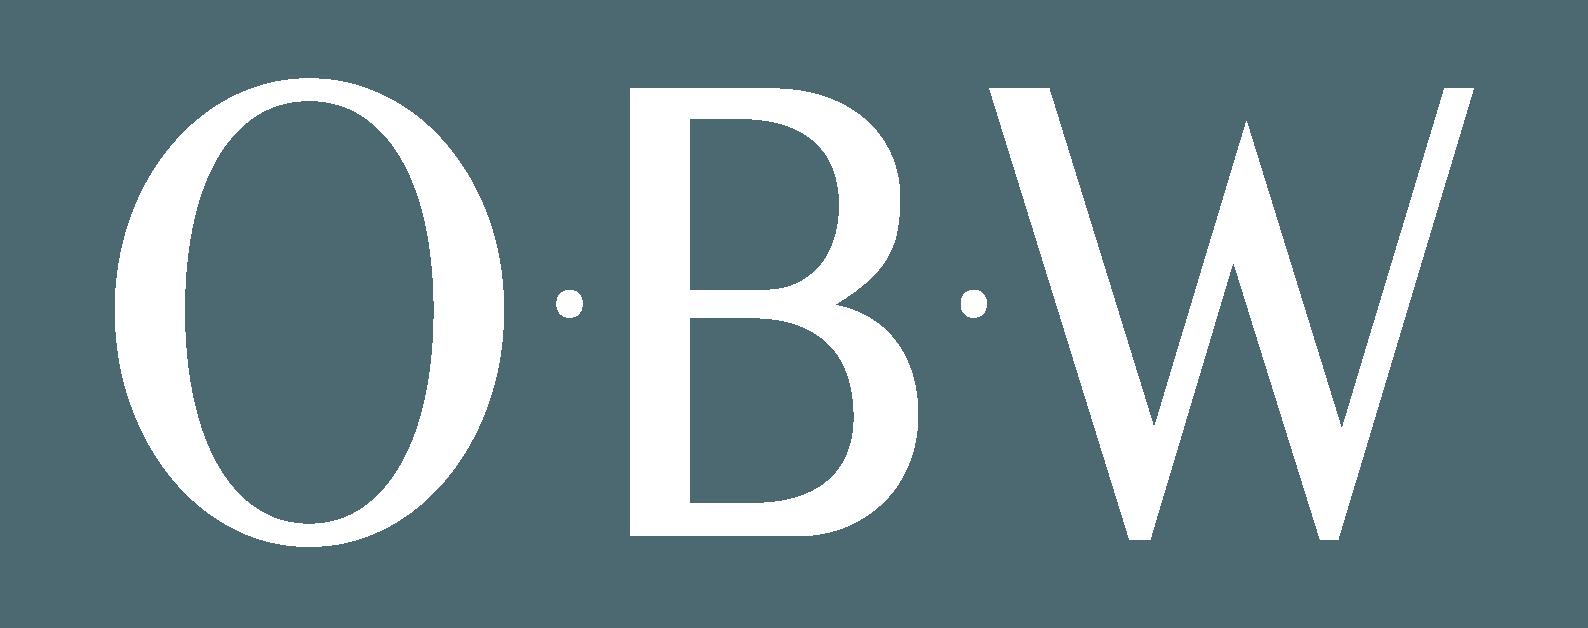 logo-blanco-OceanBlue